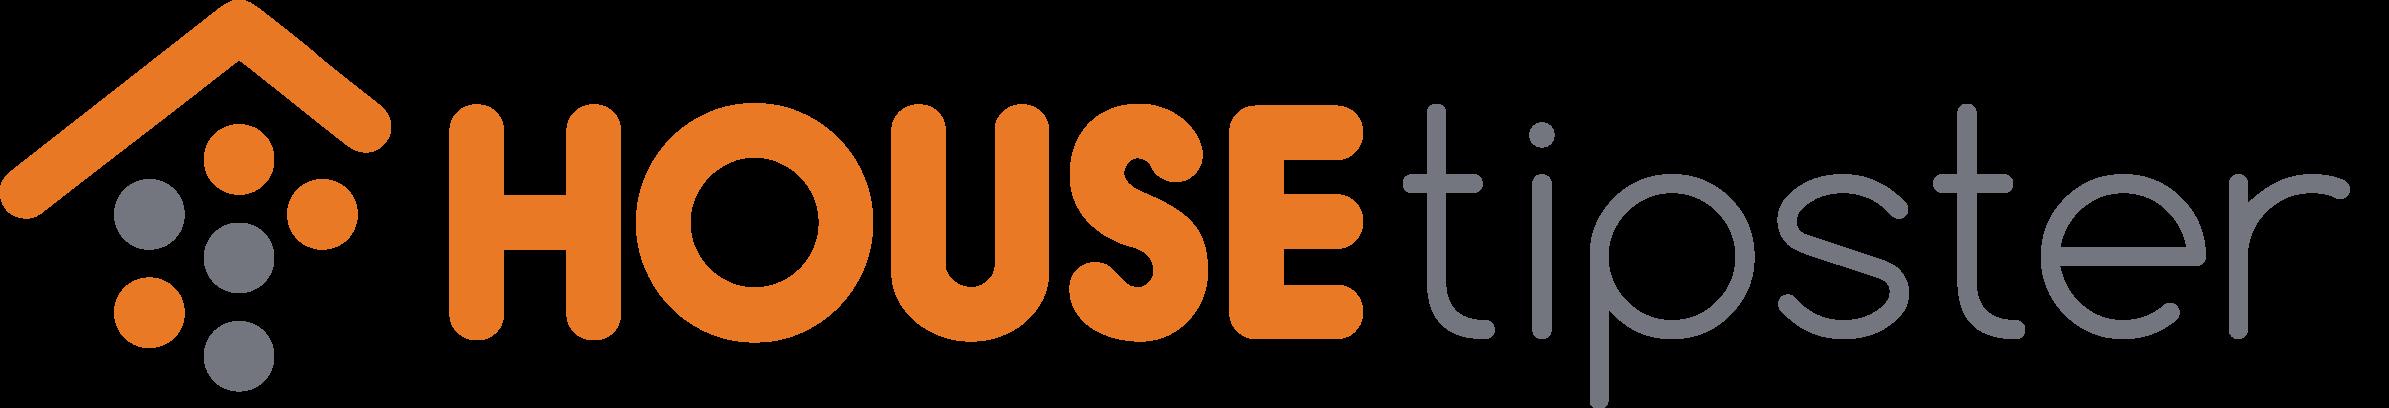 Housetipster_logo-new-big